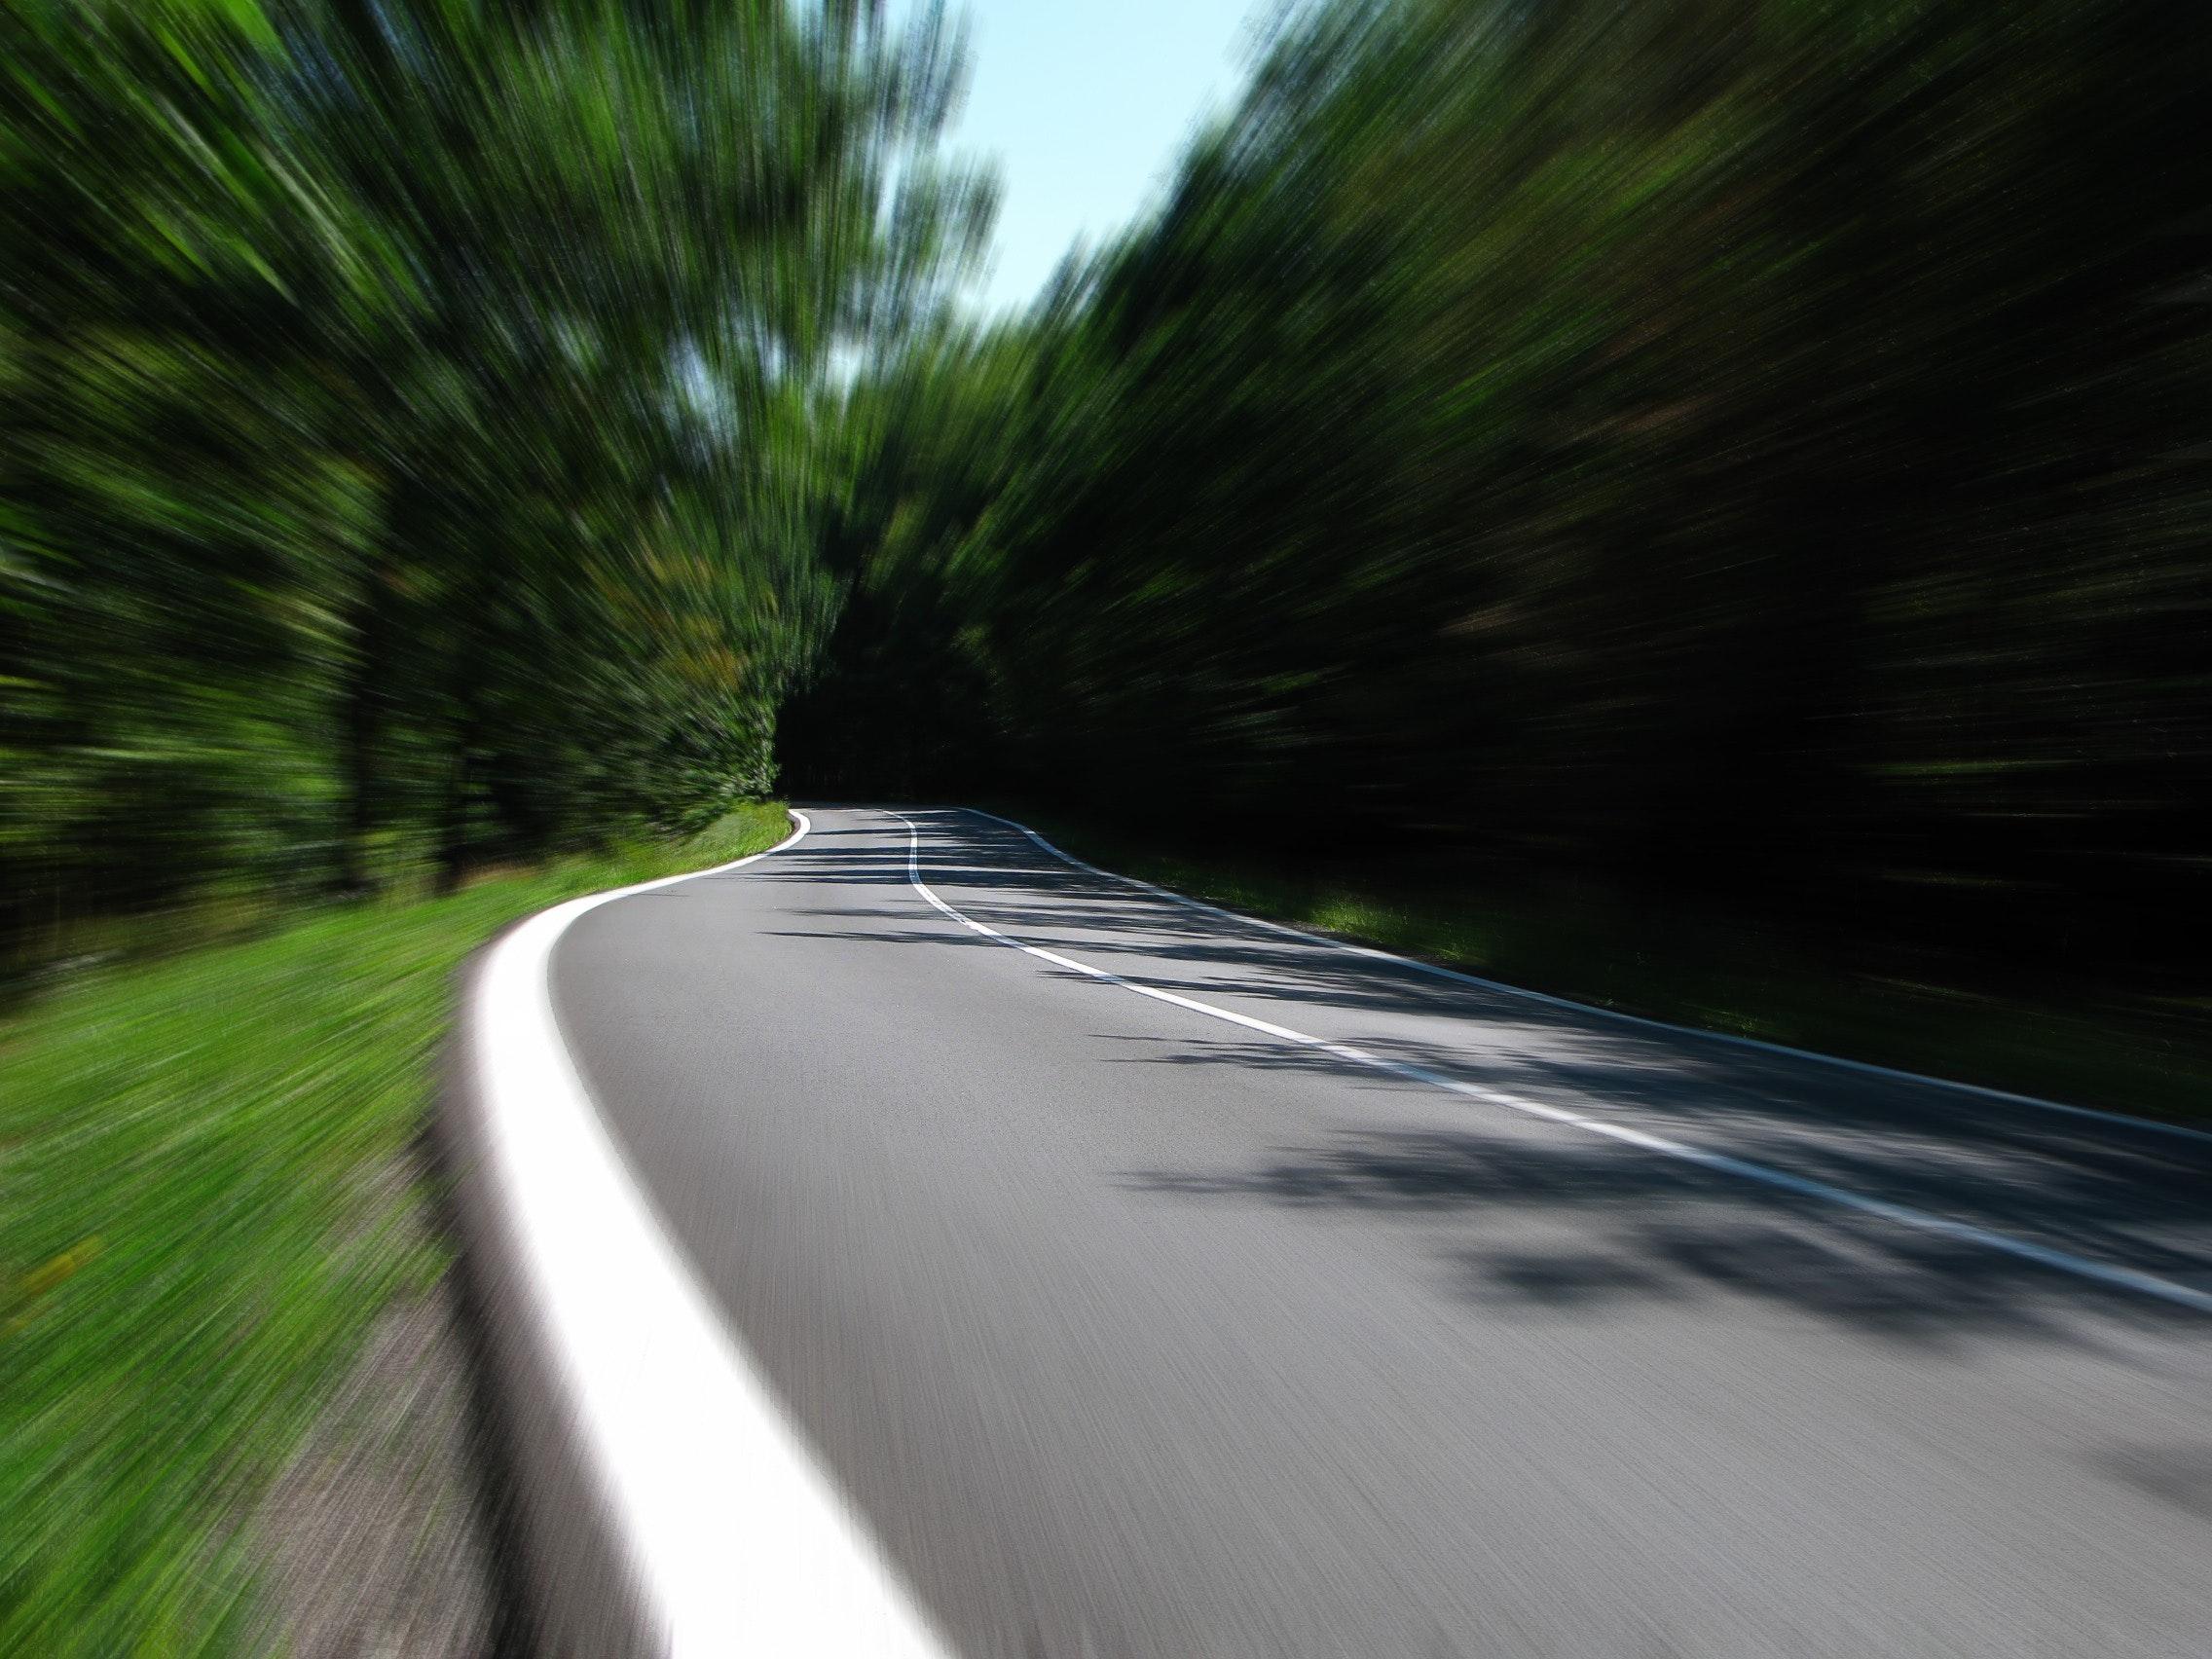 Concrete Road, Asphalt, Blurry, Highway, Lane, HQ Photo